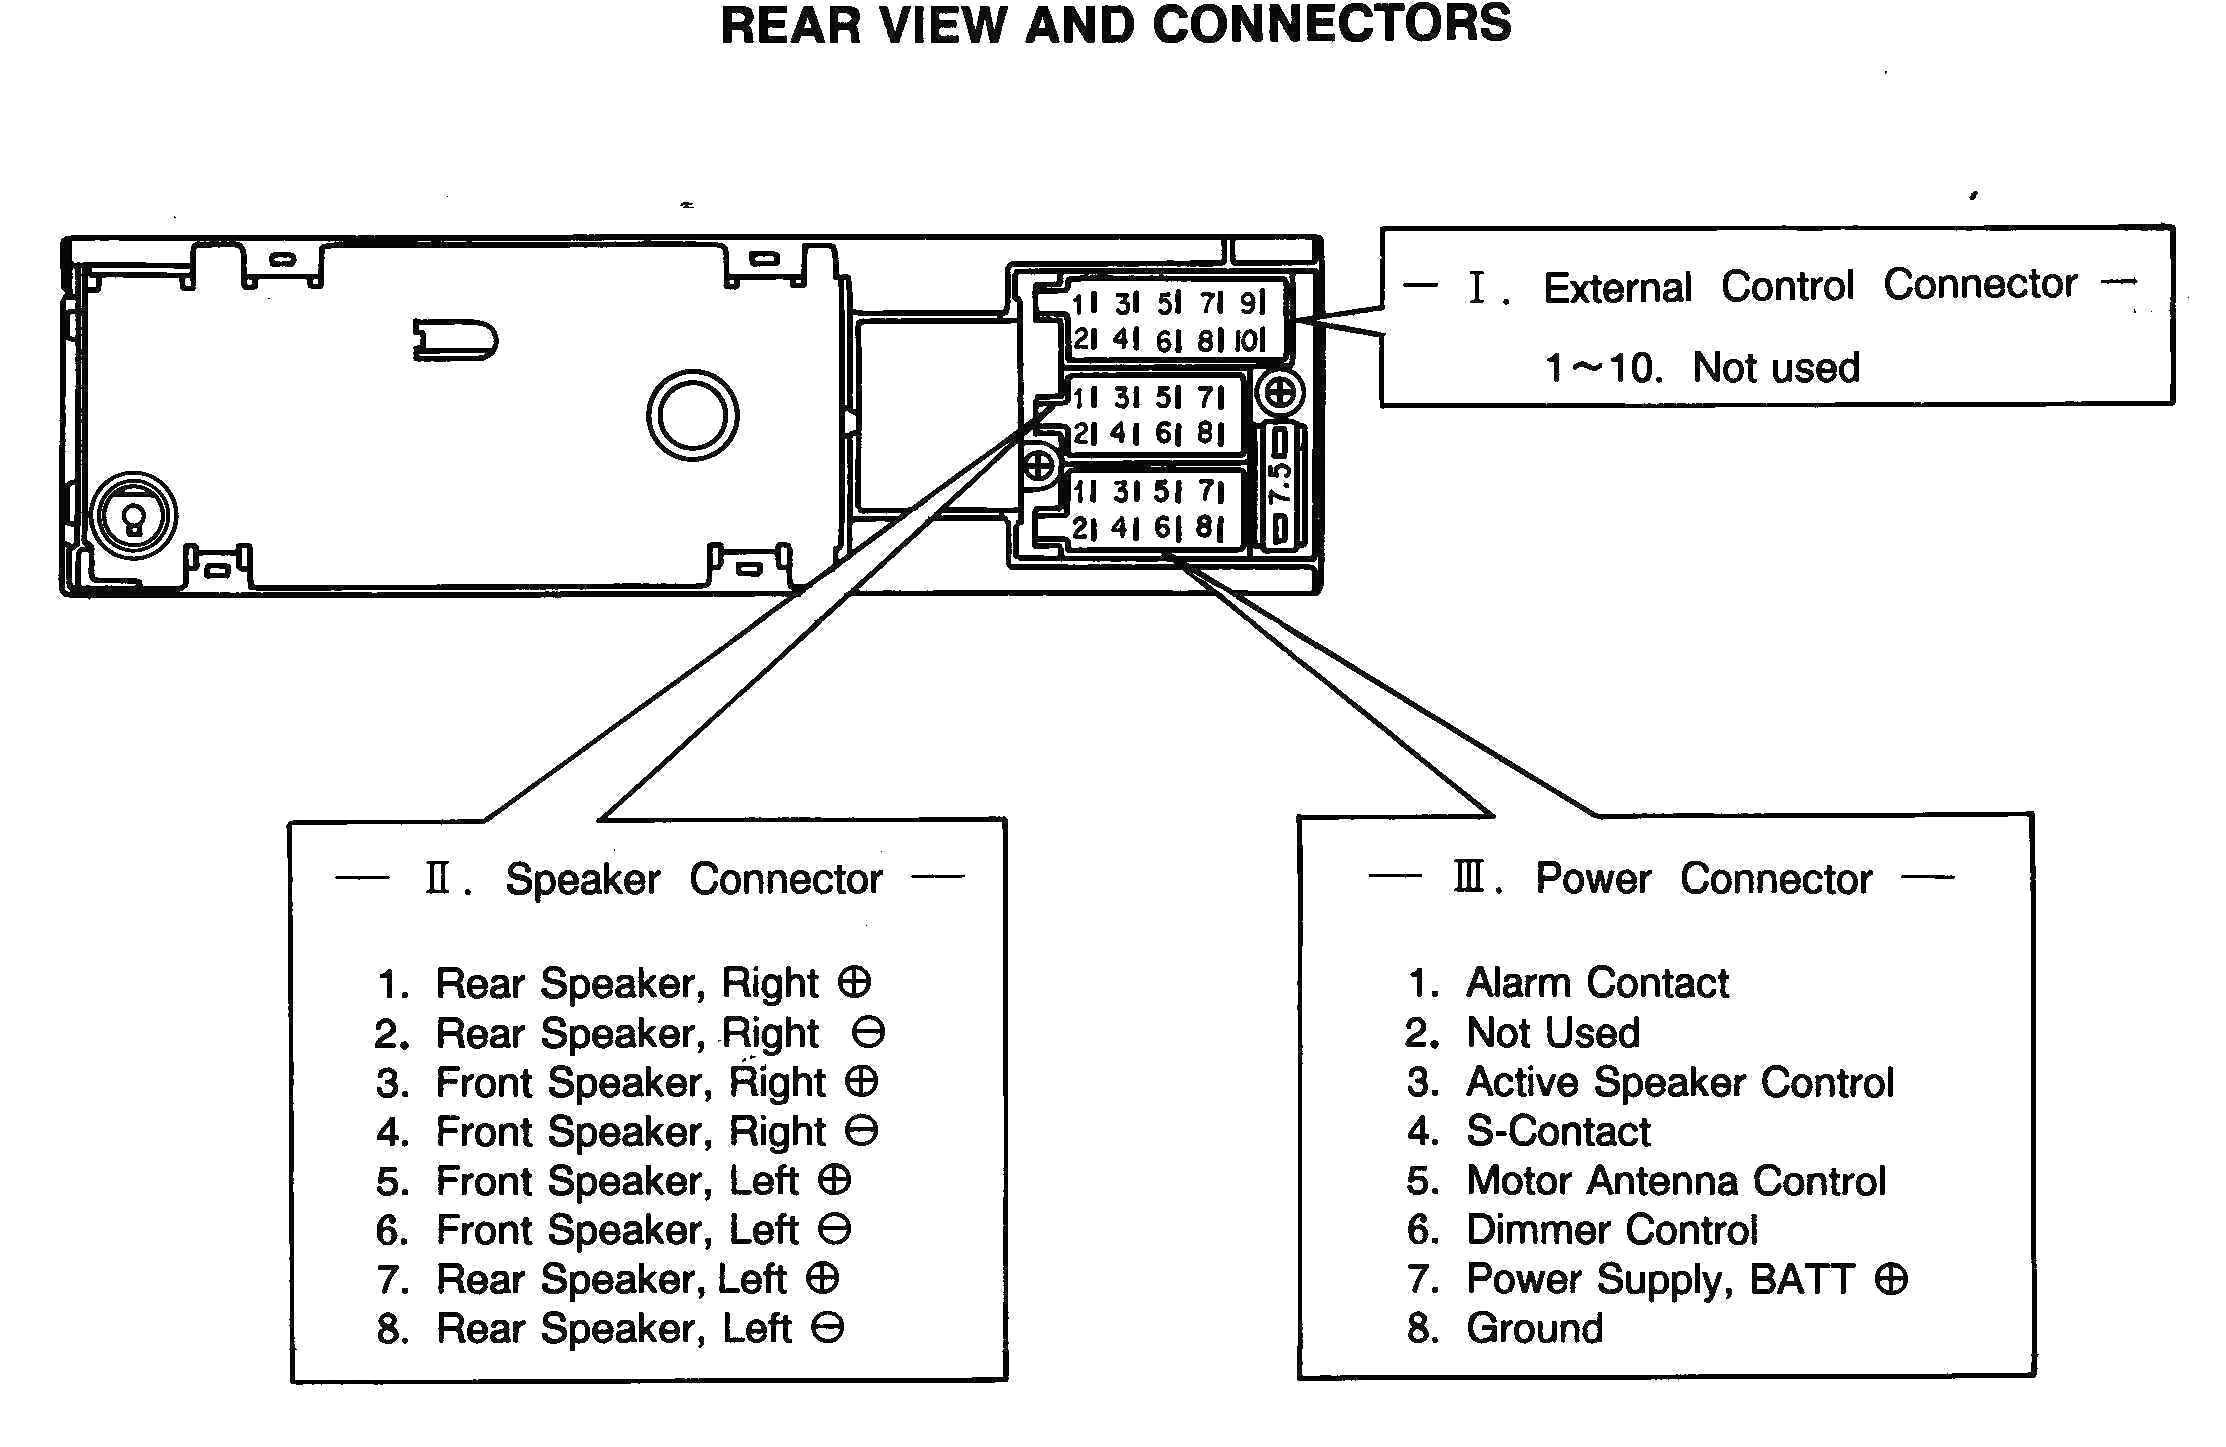 2003 Mitsubishi Eclipse Radio Wiring Diagram Rate 1999 Dodge Durango Car Radio Wiring Diagram Modified Life Wire